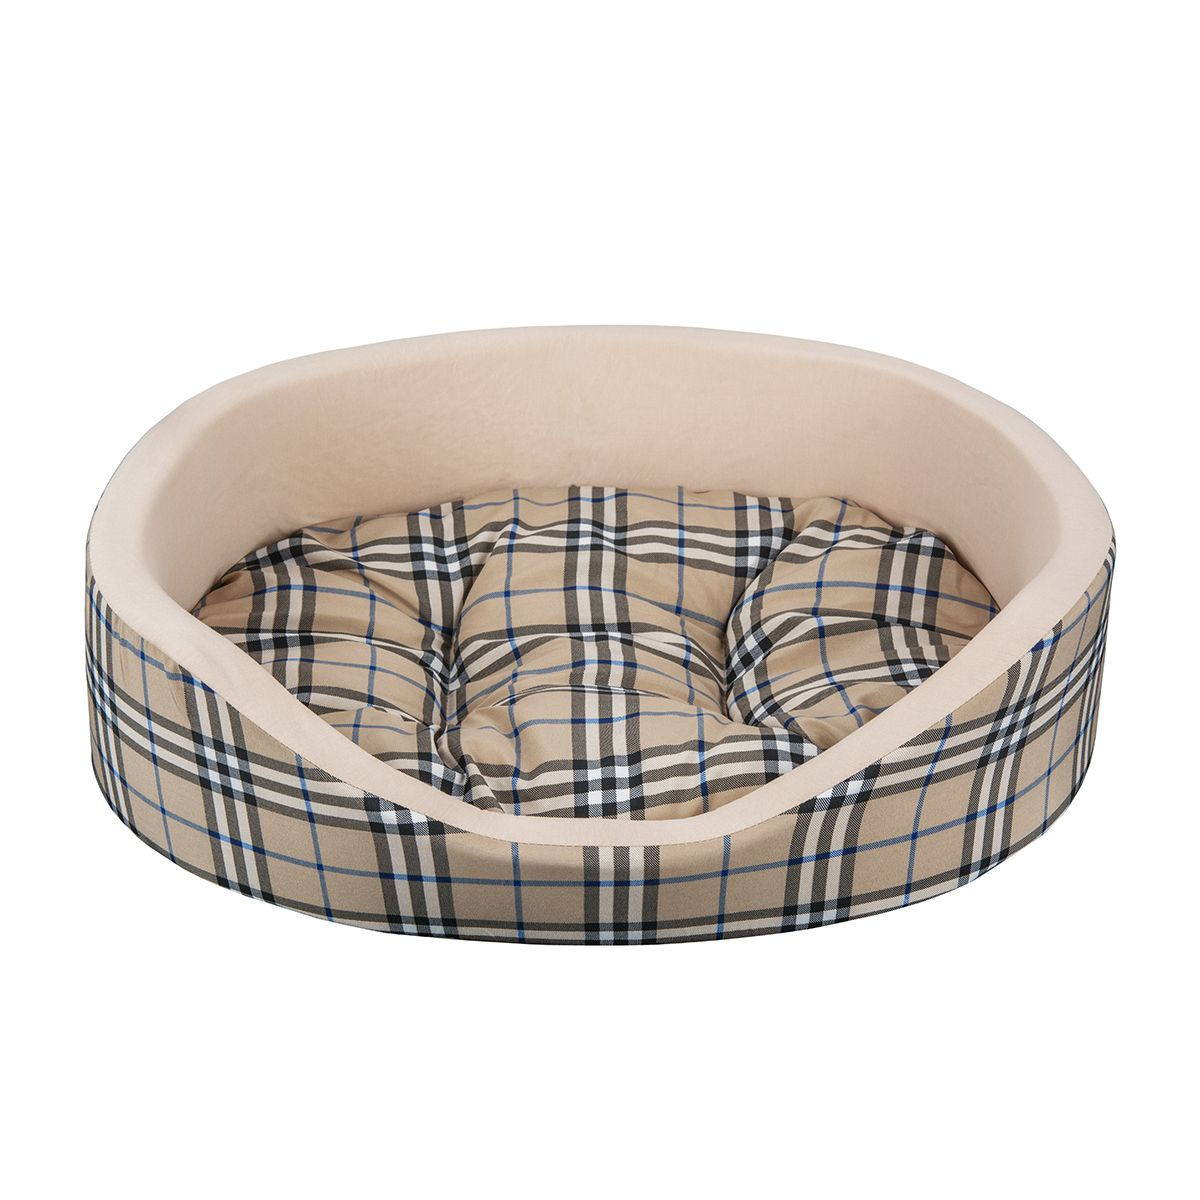 Лежак для животных Dogmoda Клетка, 48 х 39 х 15 см лежак дарэлл хантер лось 1 с подушкой 45 33 14см